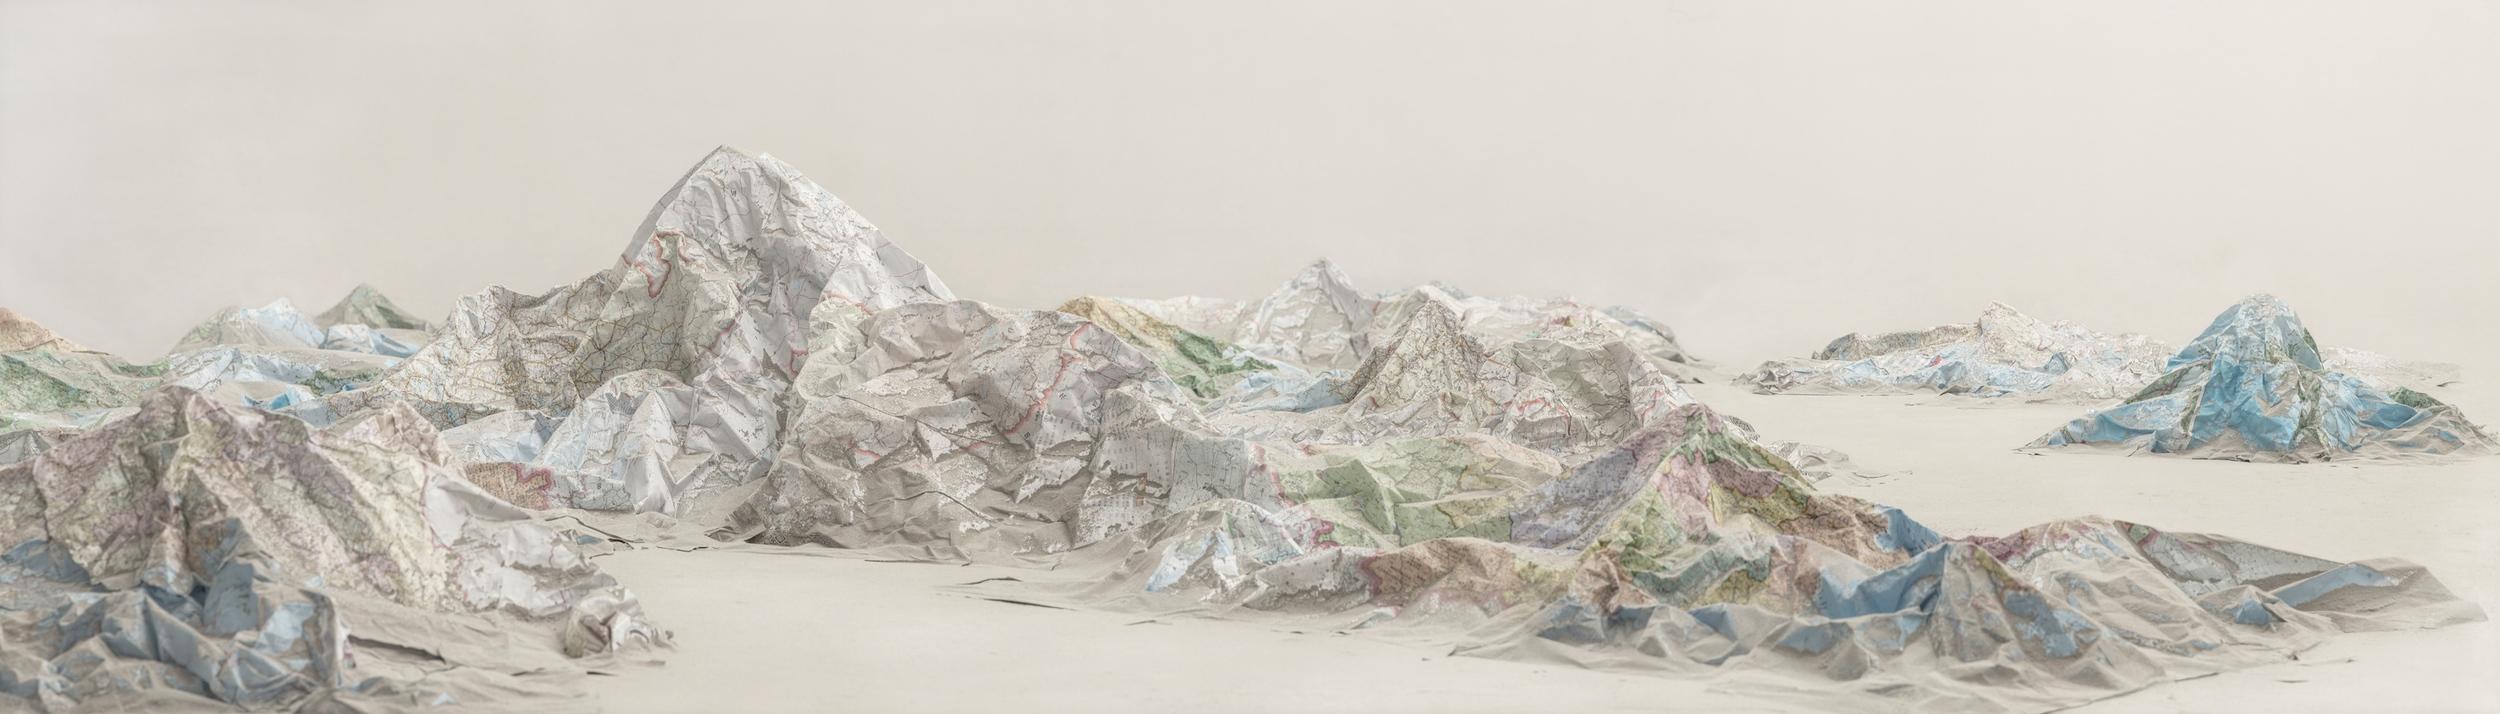 Ji Zhou 计洲, Map No.1 地图之一, 2013, Ultra Giclee 艺术微喷, 85 x 300 cm, Ed of 8